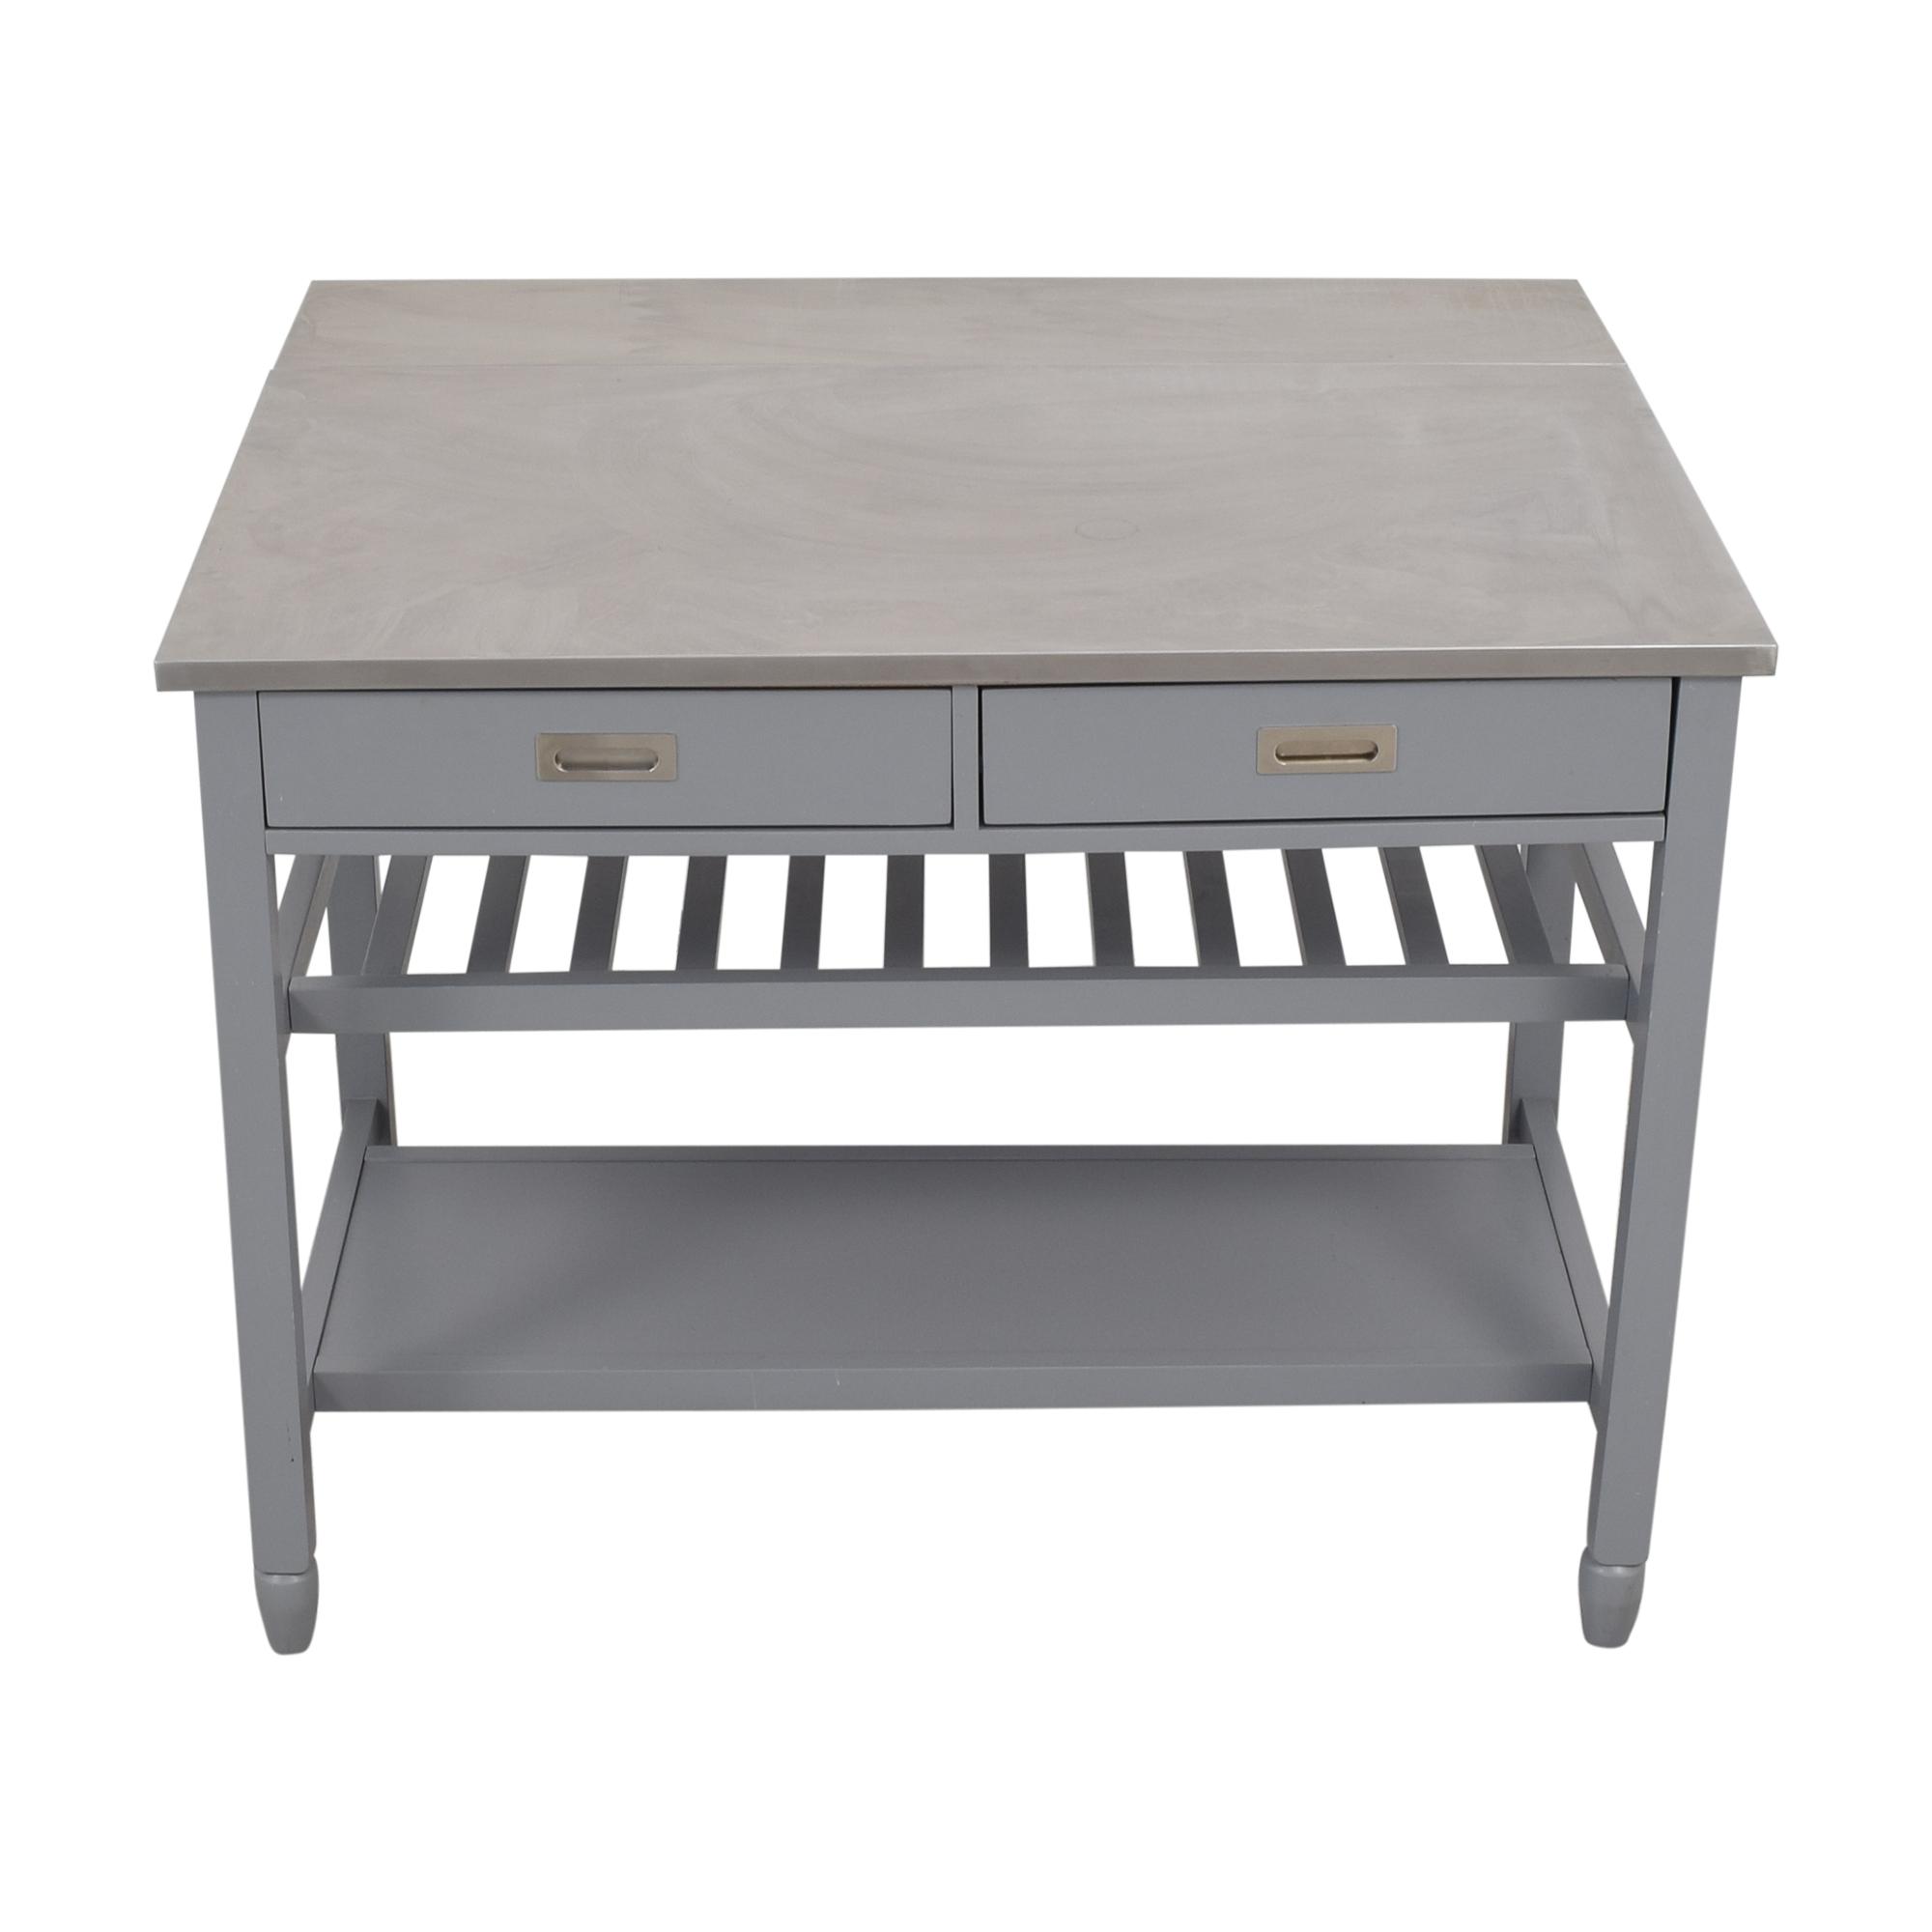 Crate & Barrel Crate & Barrel Belmont Open Kitchen Island grey